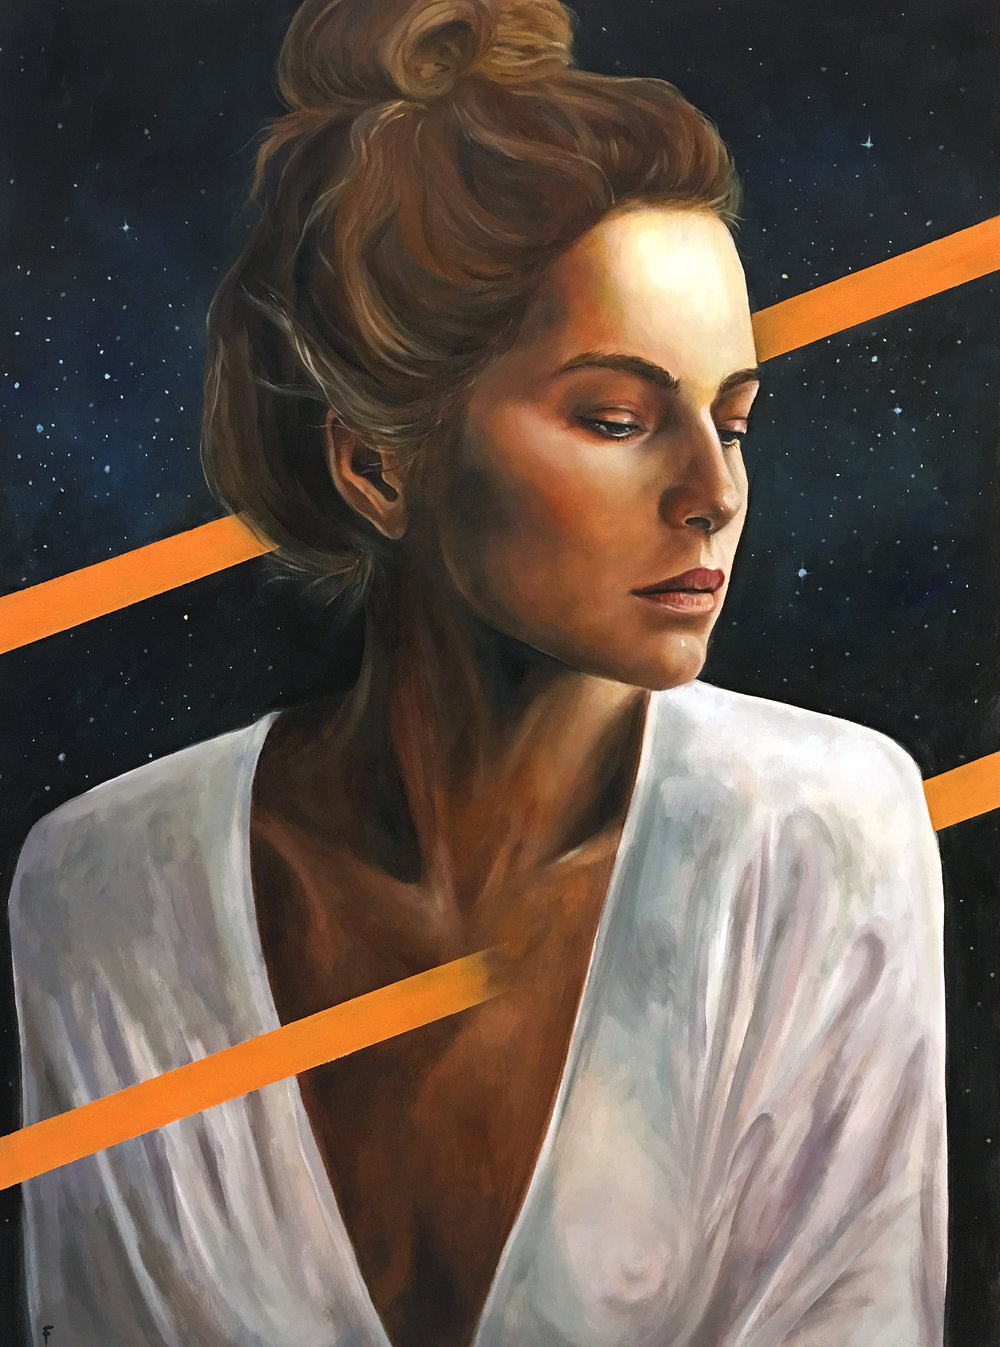 Valentina_painting_2016.jpg